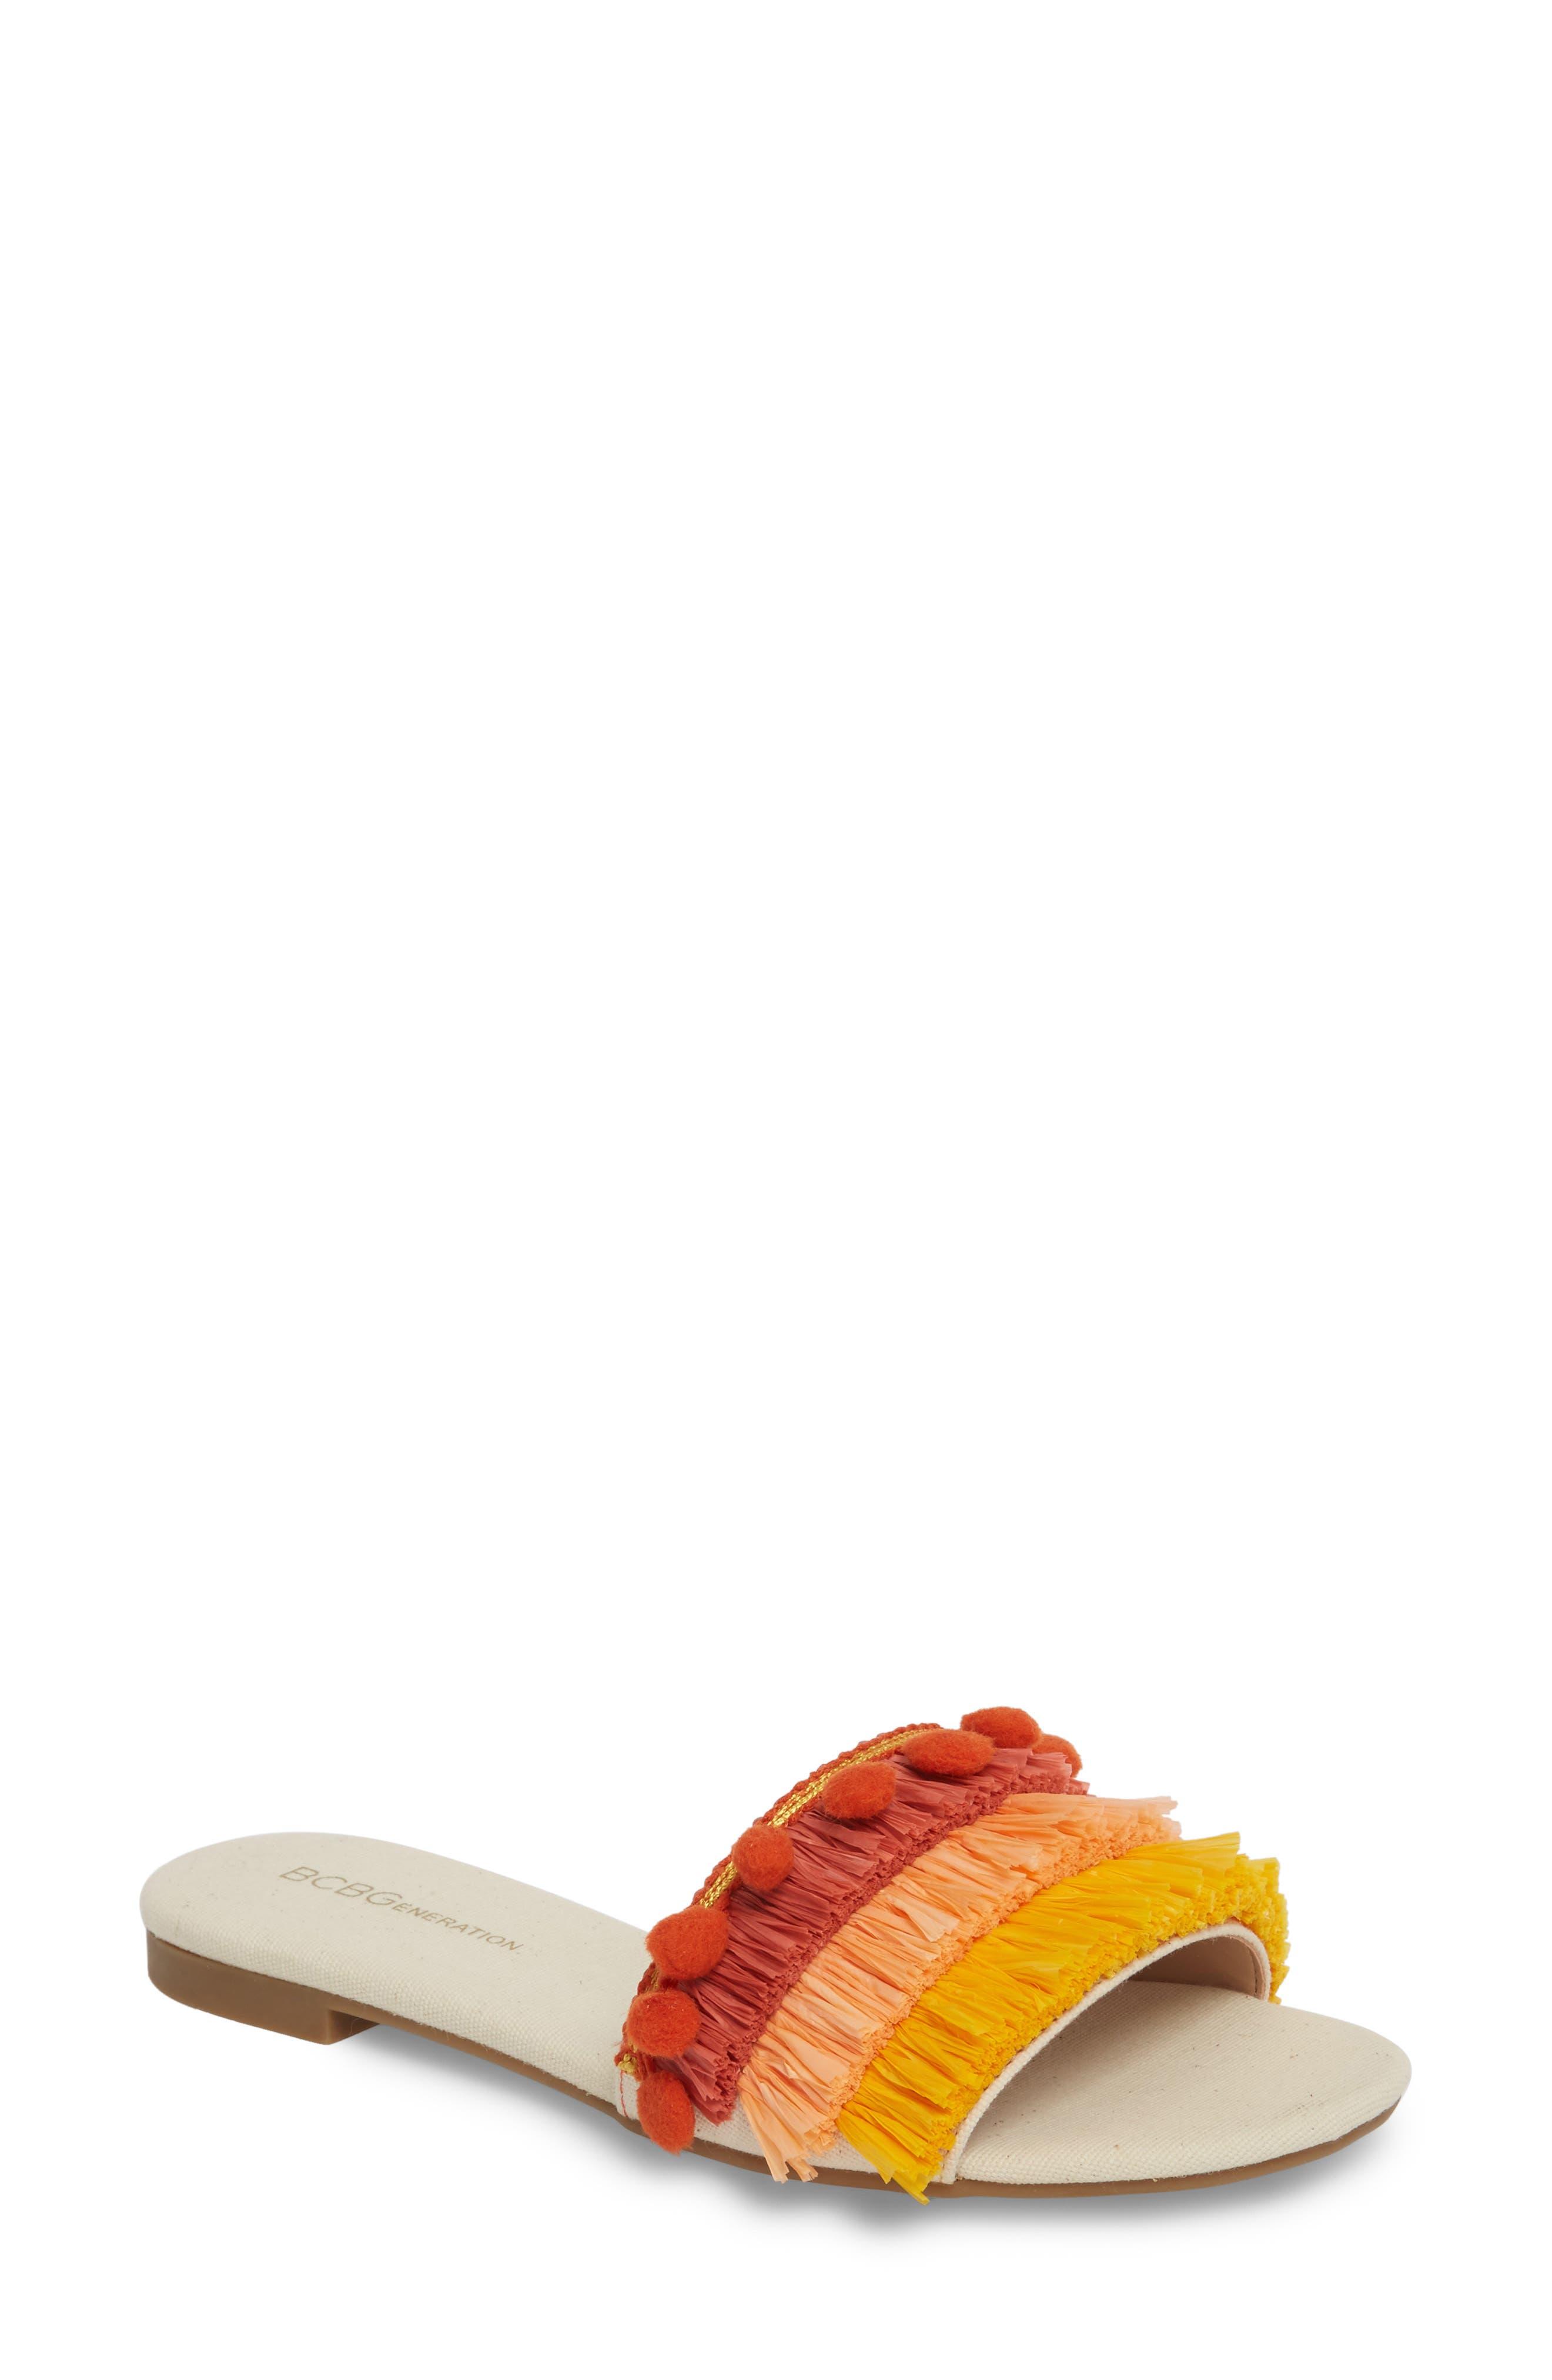 Genna Raffia Tier Slide Sandal,                             Main thumbnail 1, color,                             750